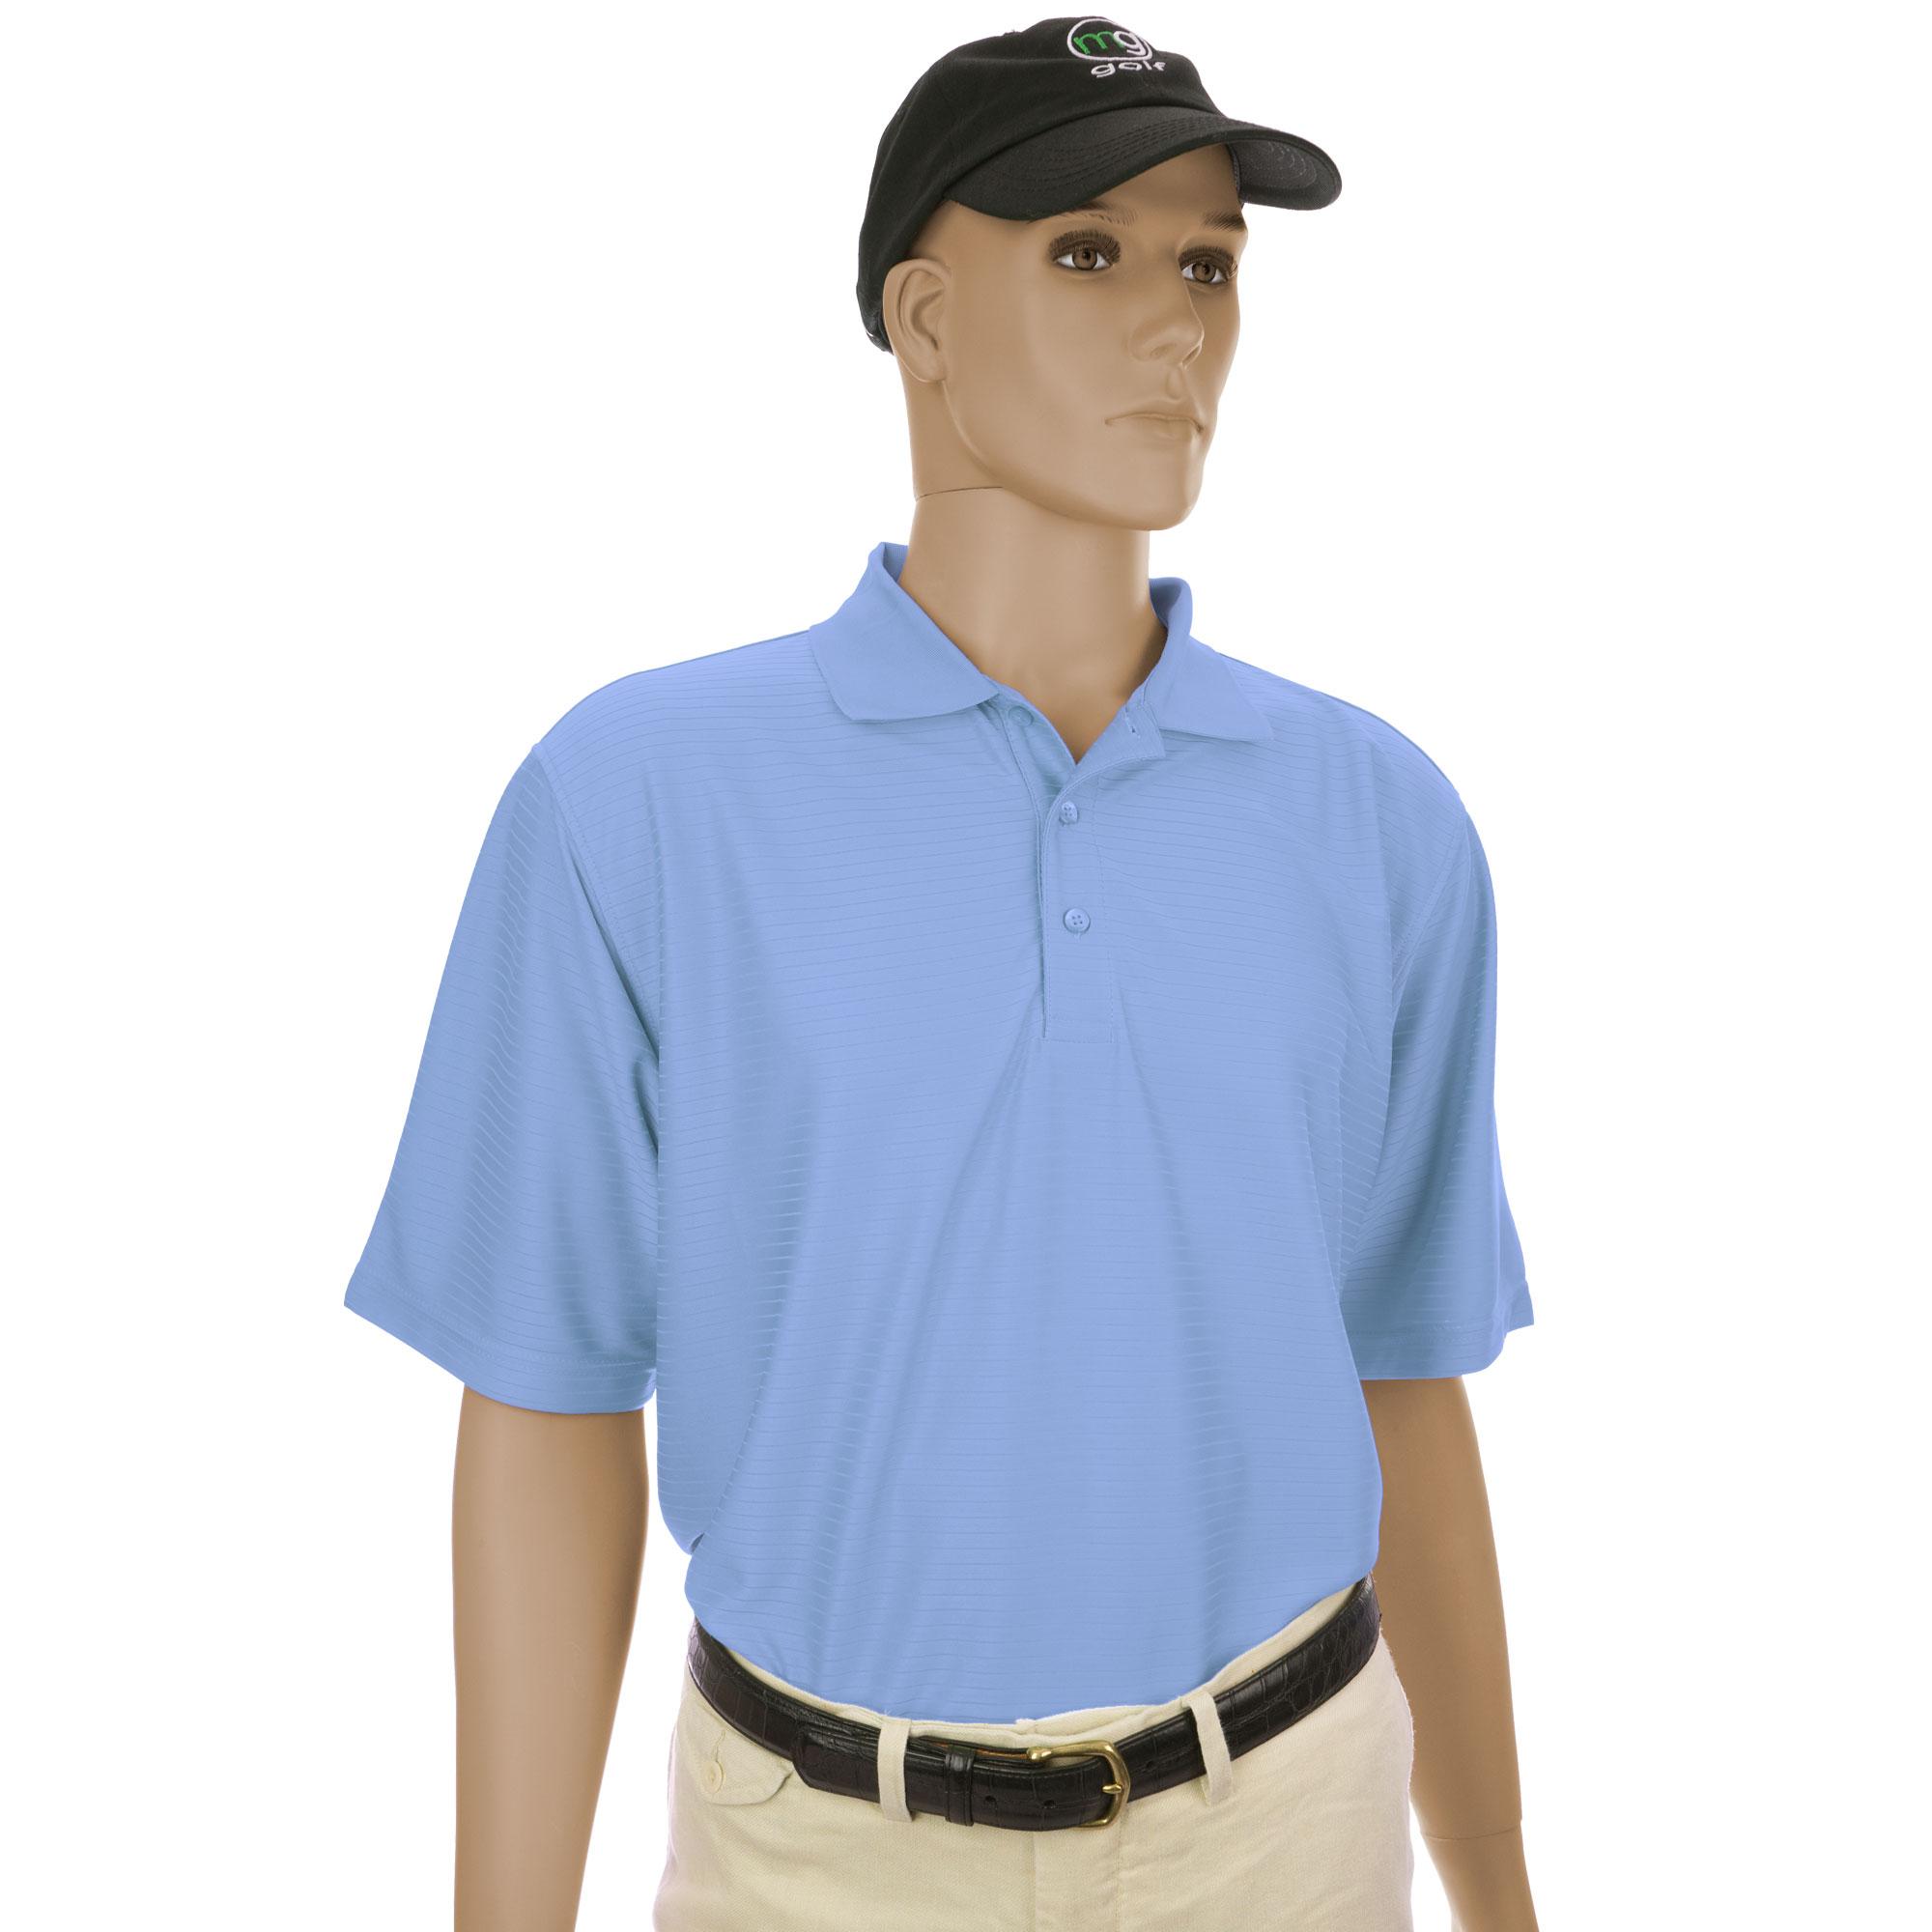 Womens Plus Size Golf Shirts Bcd Tofu House